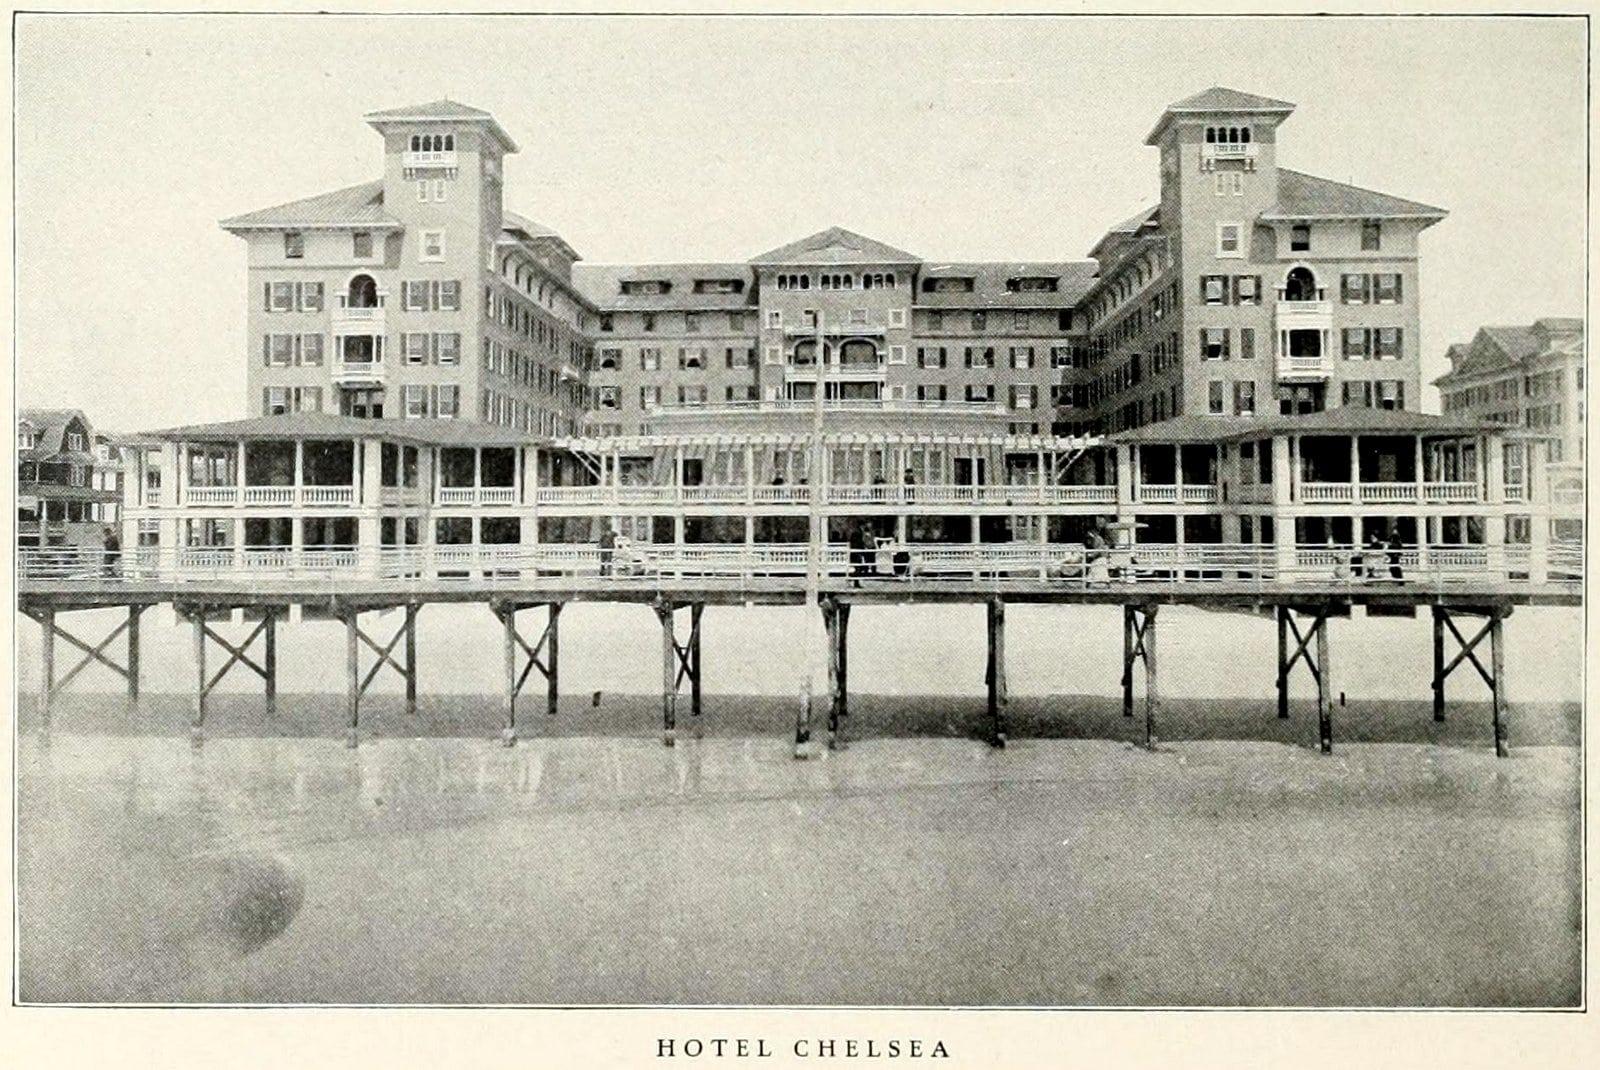 Hotel Chelsea - Old Atlantic City (1911)